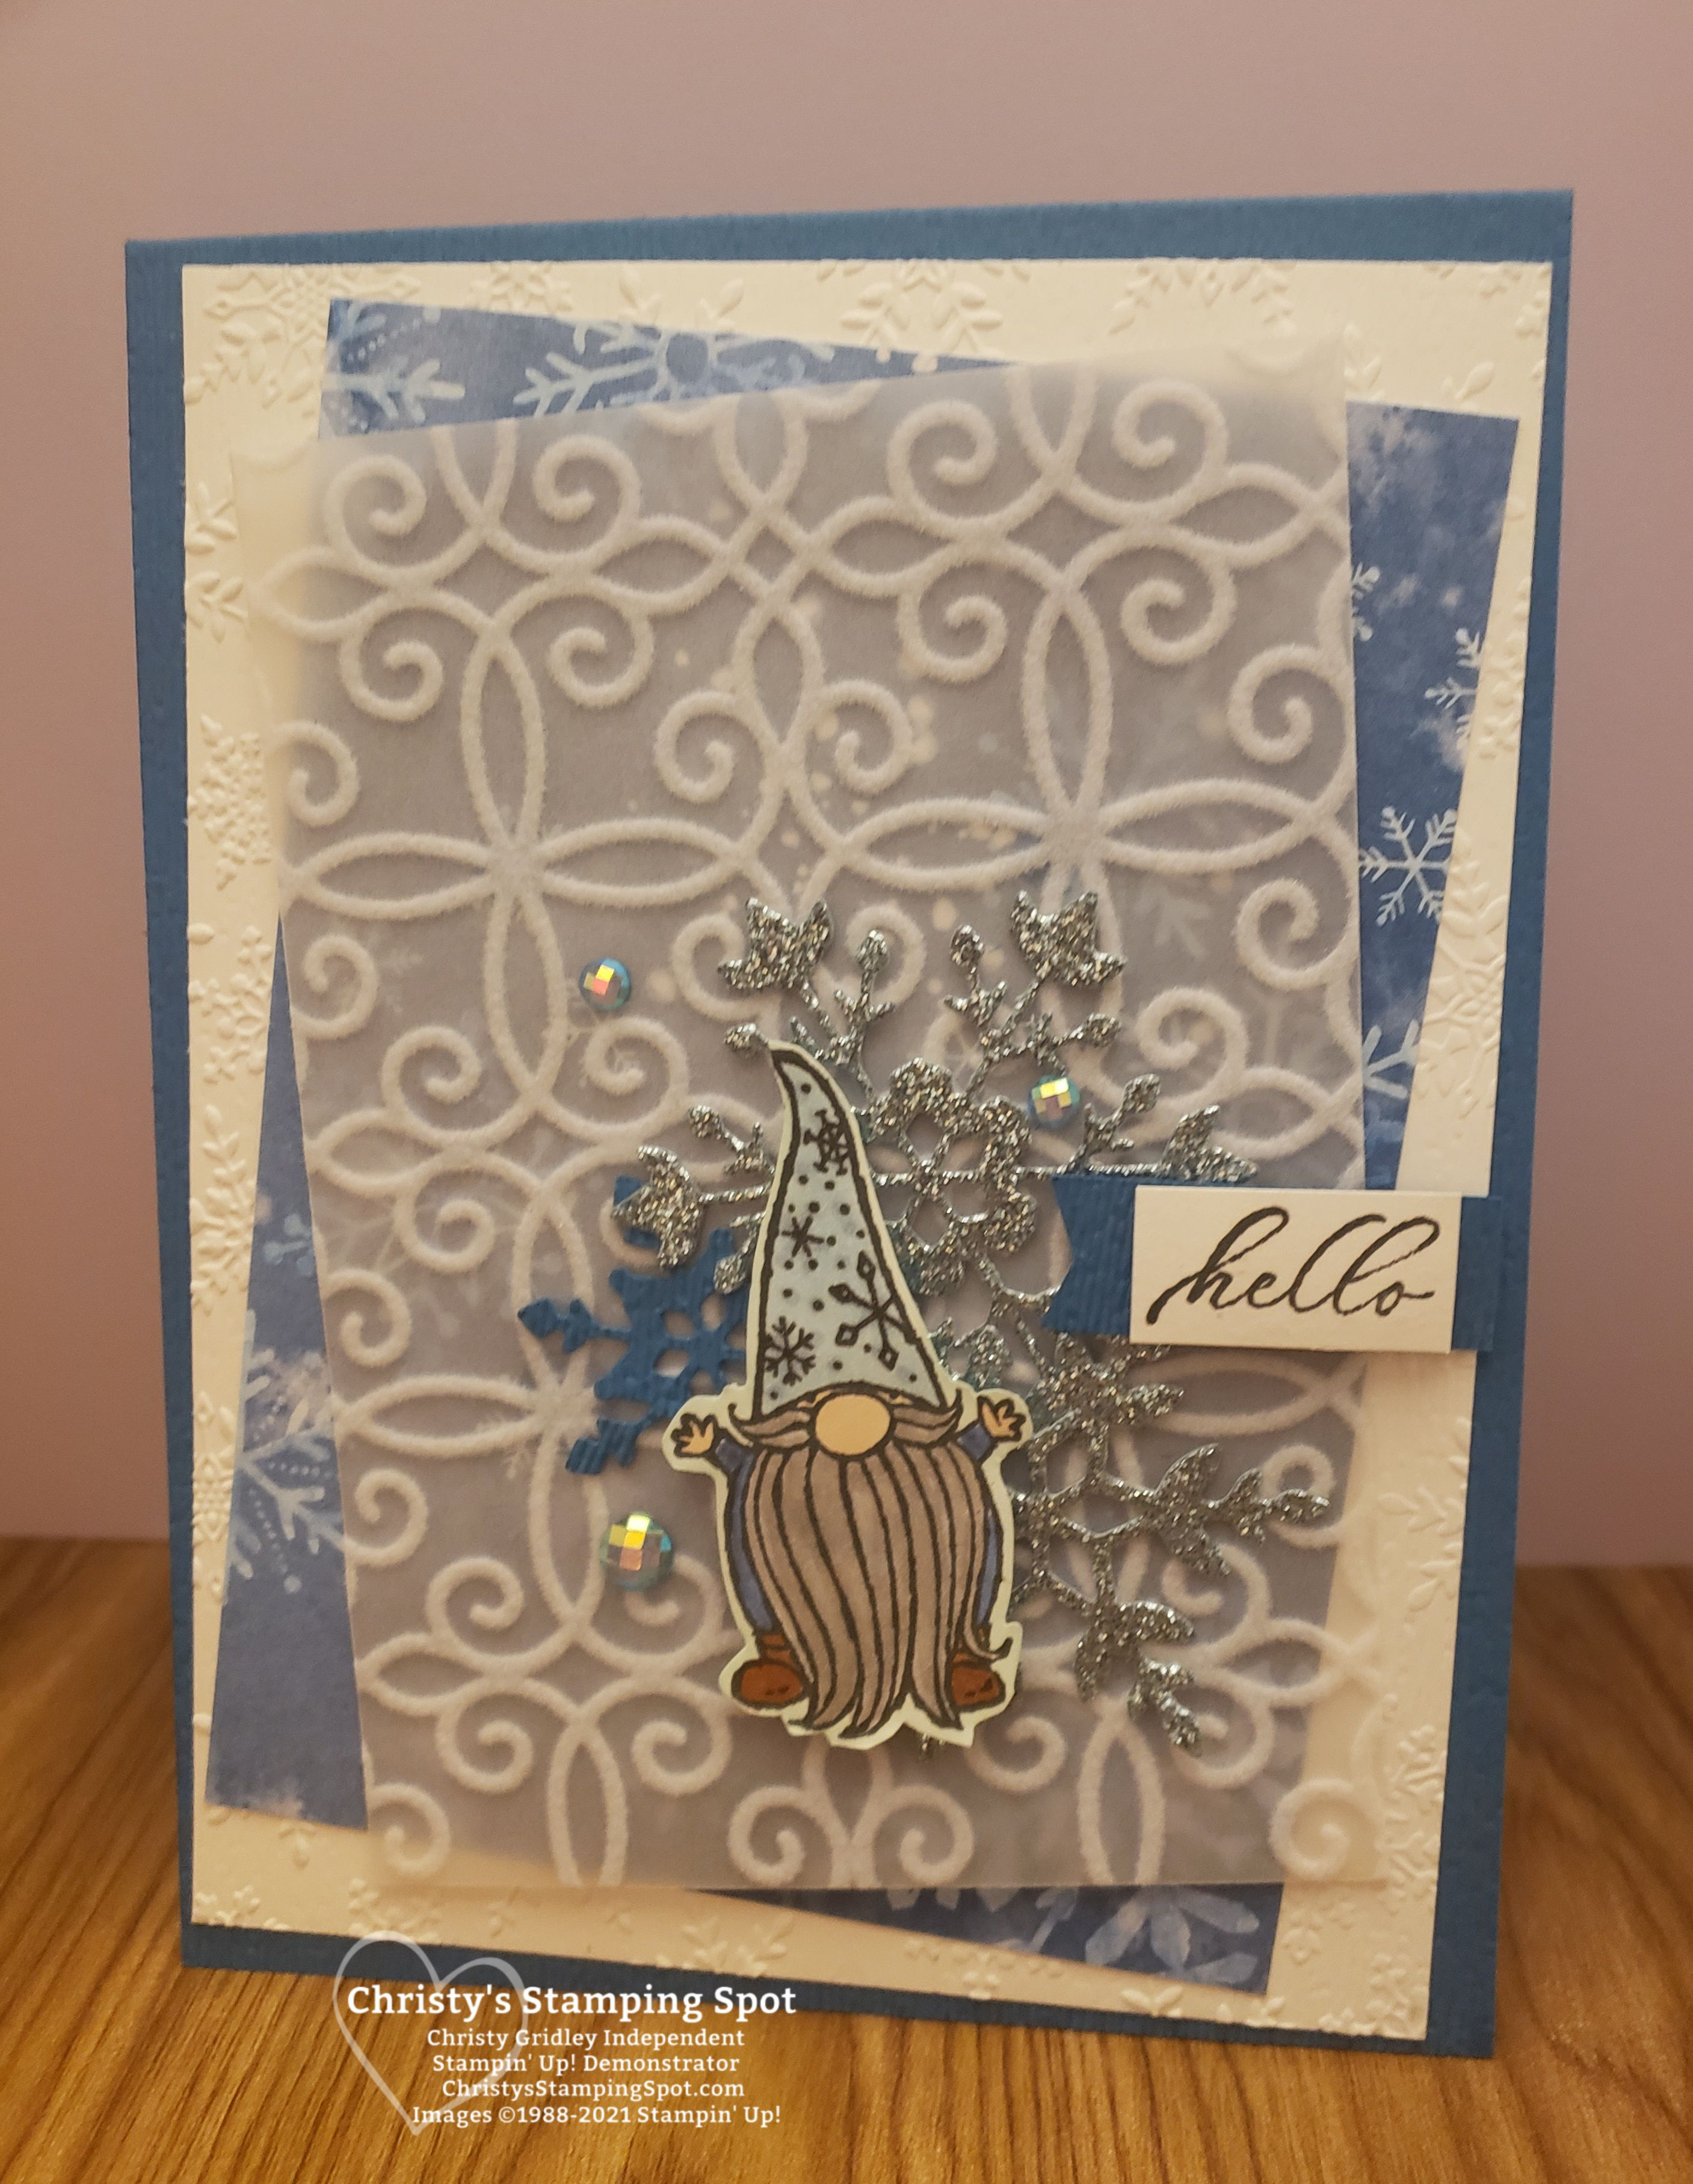 Handmade Cards Using 2020 Christmas Dsp From Stampin Up Stampin' Up! Gnome & Snowflake Splendor Sneak Peek in 2020